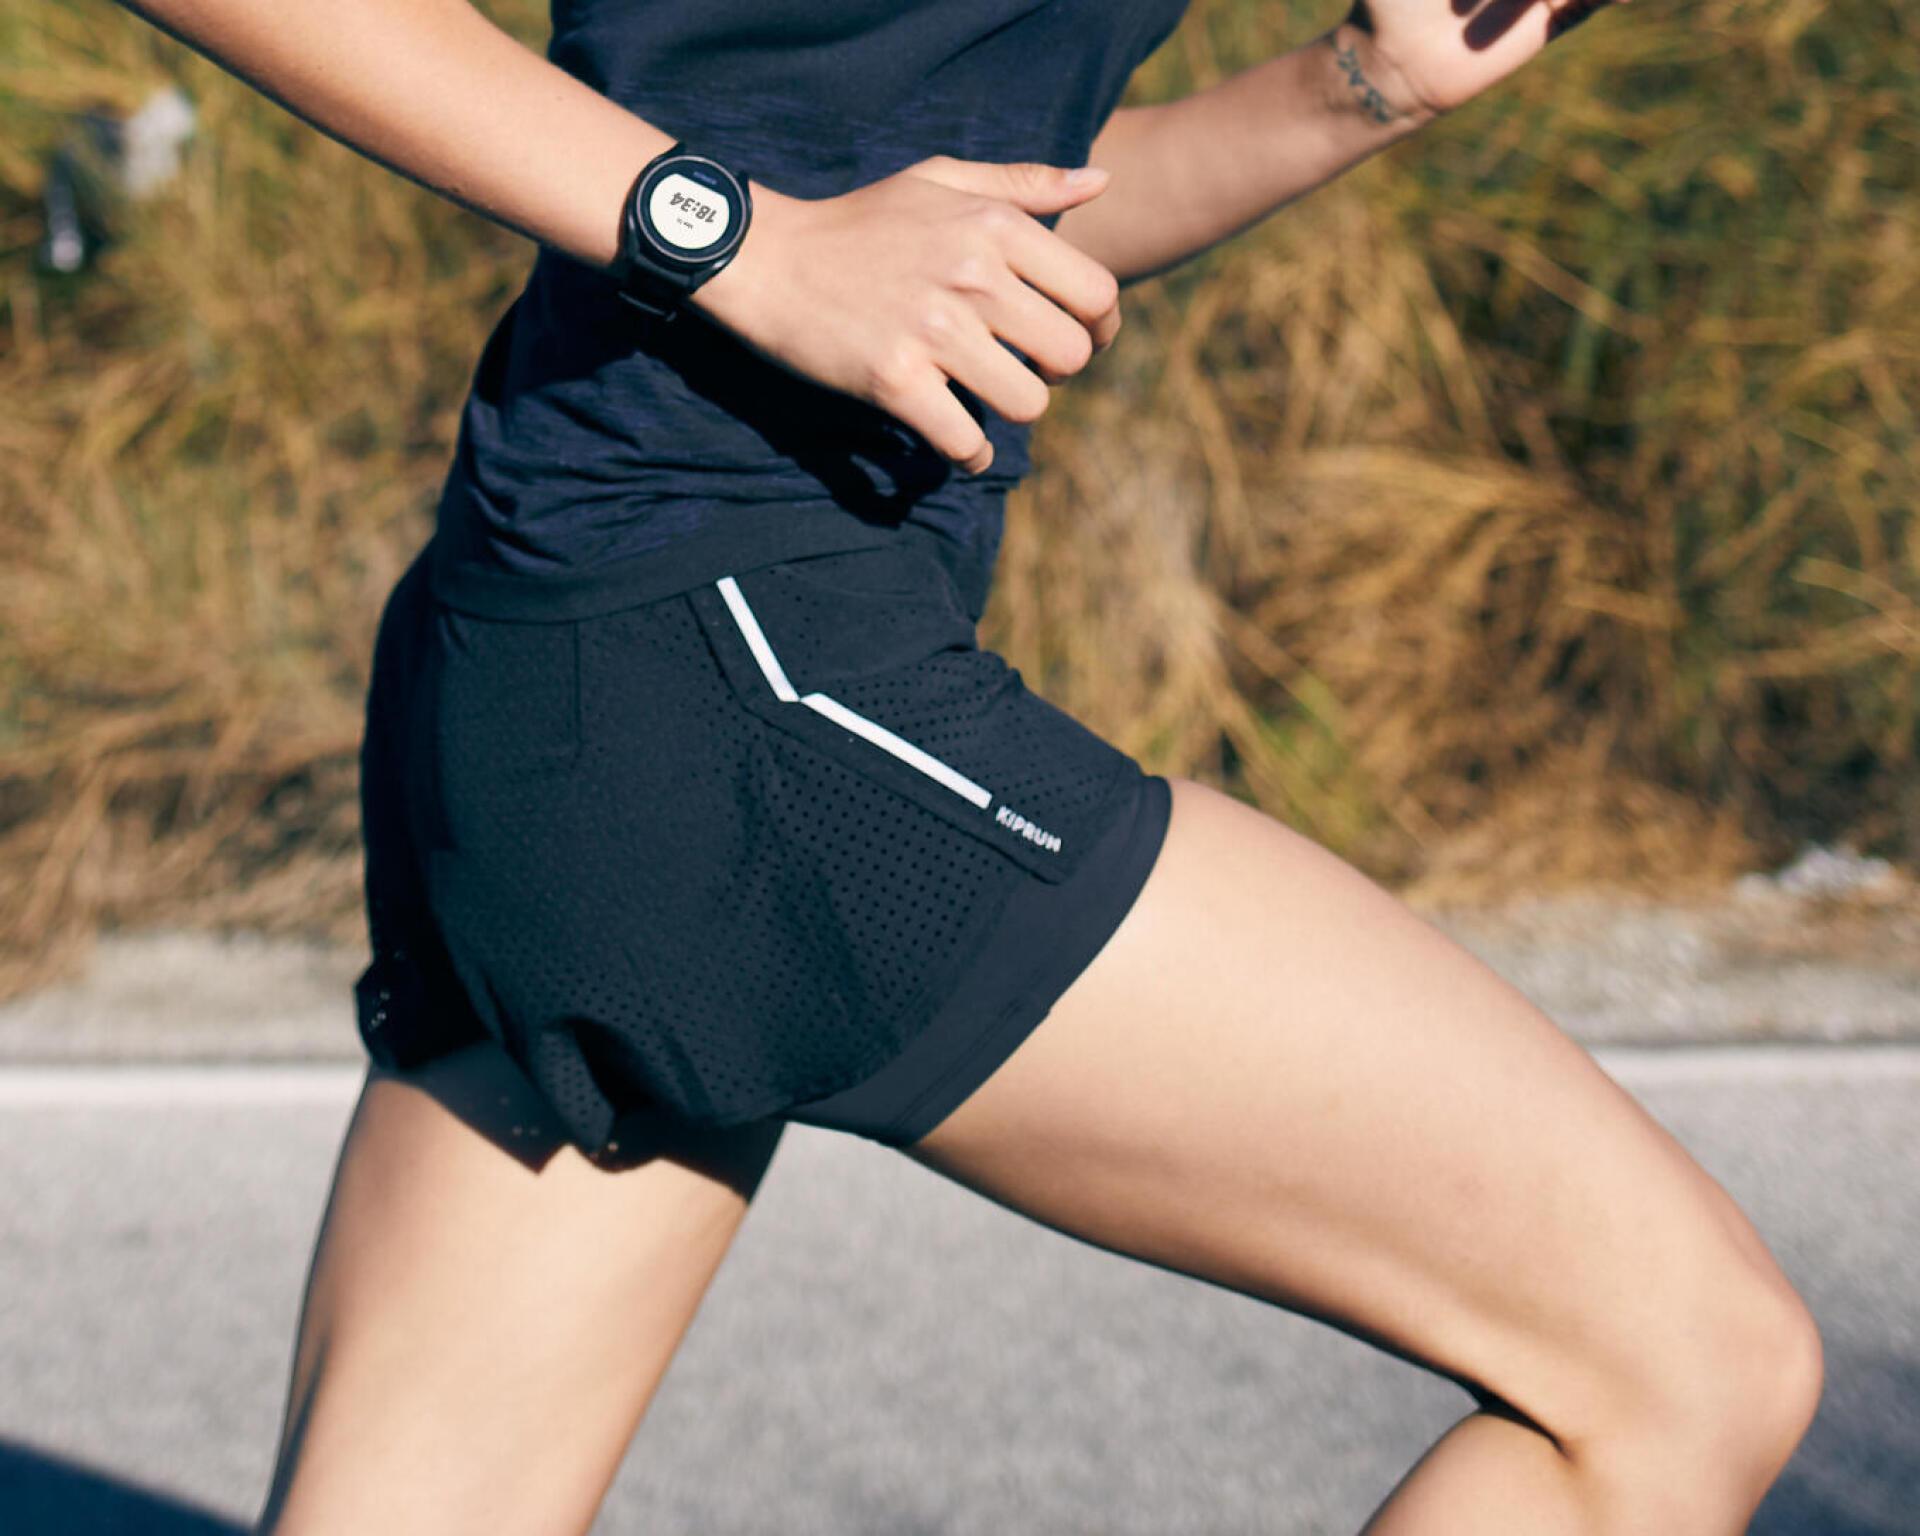 KIPRUN WOMEN'S 2-IN-1 RUNNING SHORTS WITH BUILT-IN TIGHT SHORTS - BLACK